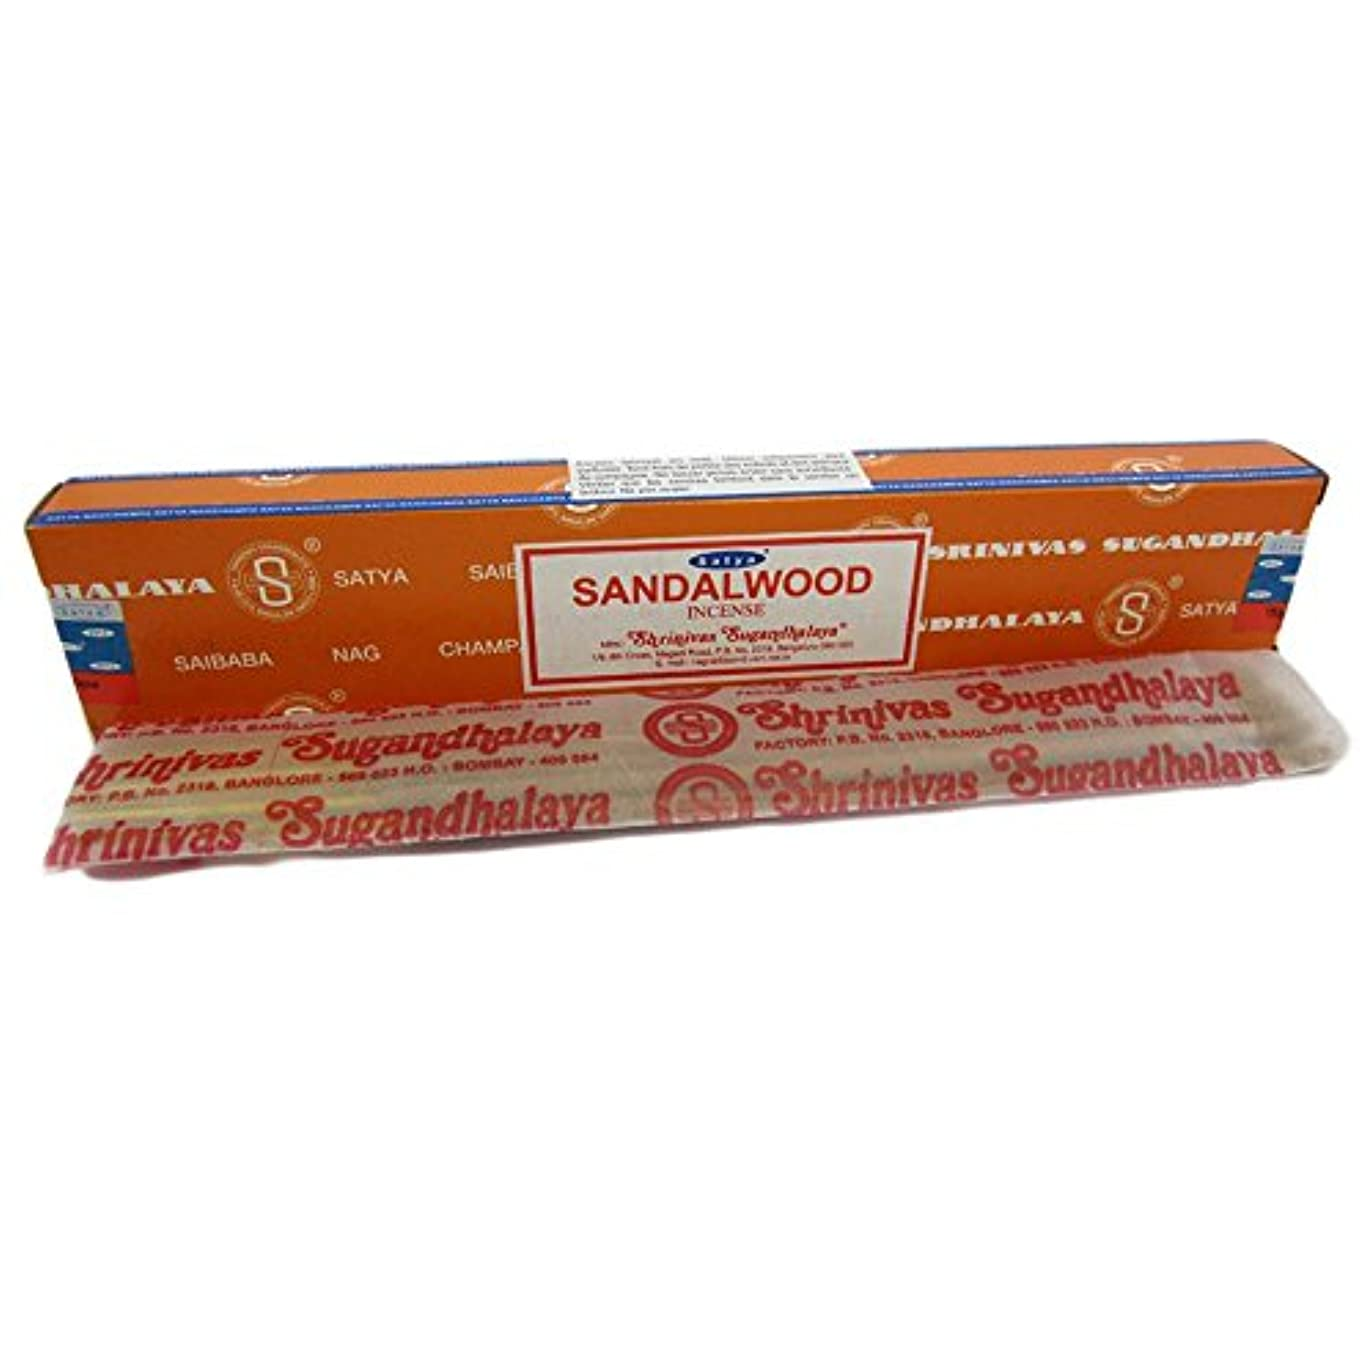 Sandalwood Nag Champa Incense Sticks 15g Box